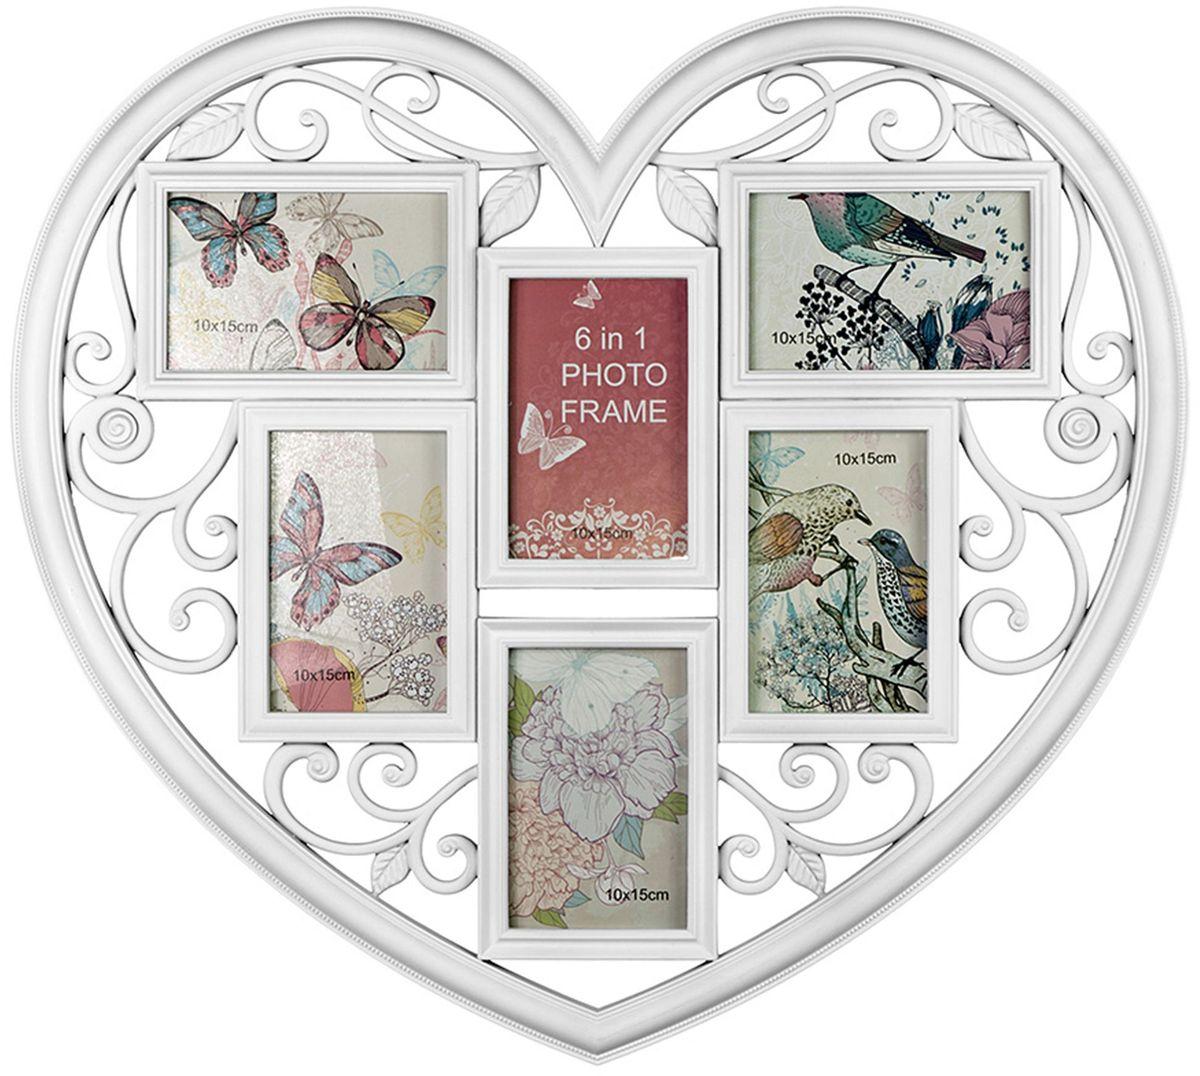 Коллаж Platinum Сердце, цвет: белый, 6 фоторамок. BIN-1123026BIN-1123026-White-БелыйПластиковый коллаж с 6 фото 10х15 см.